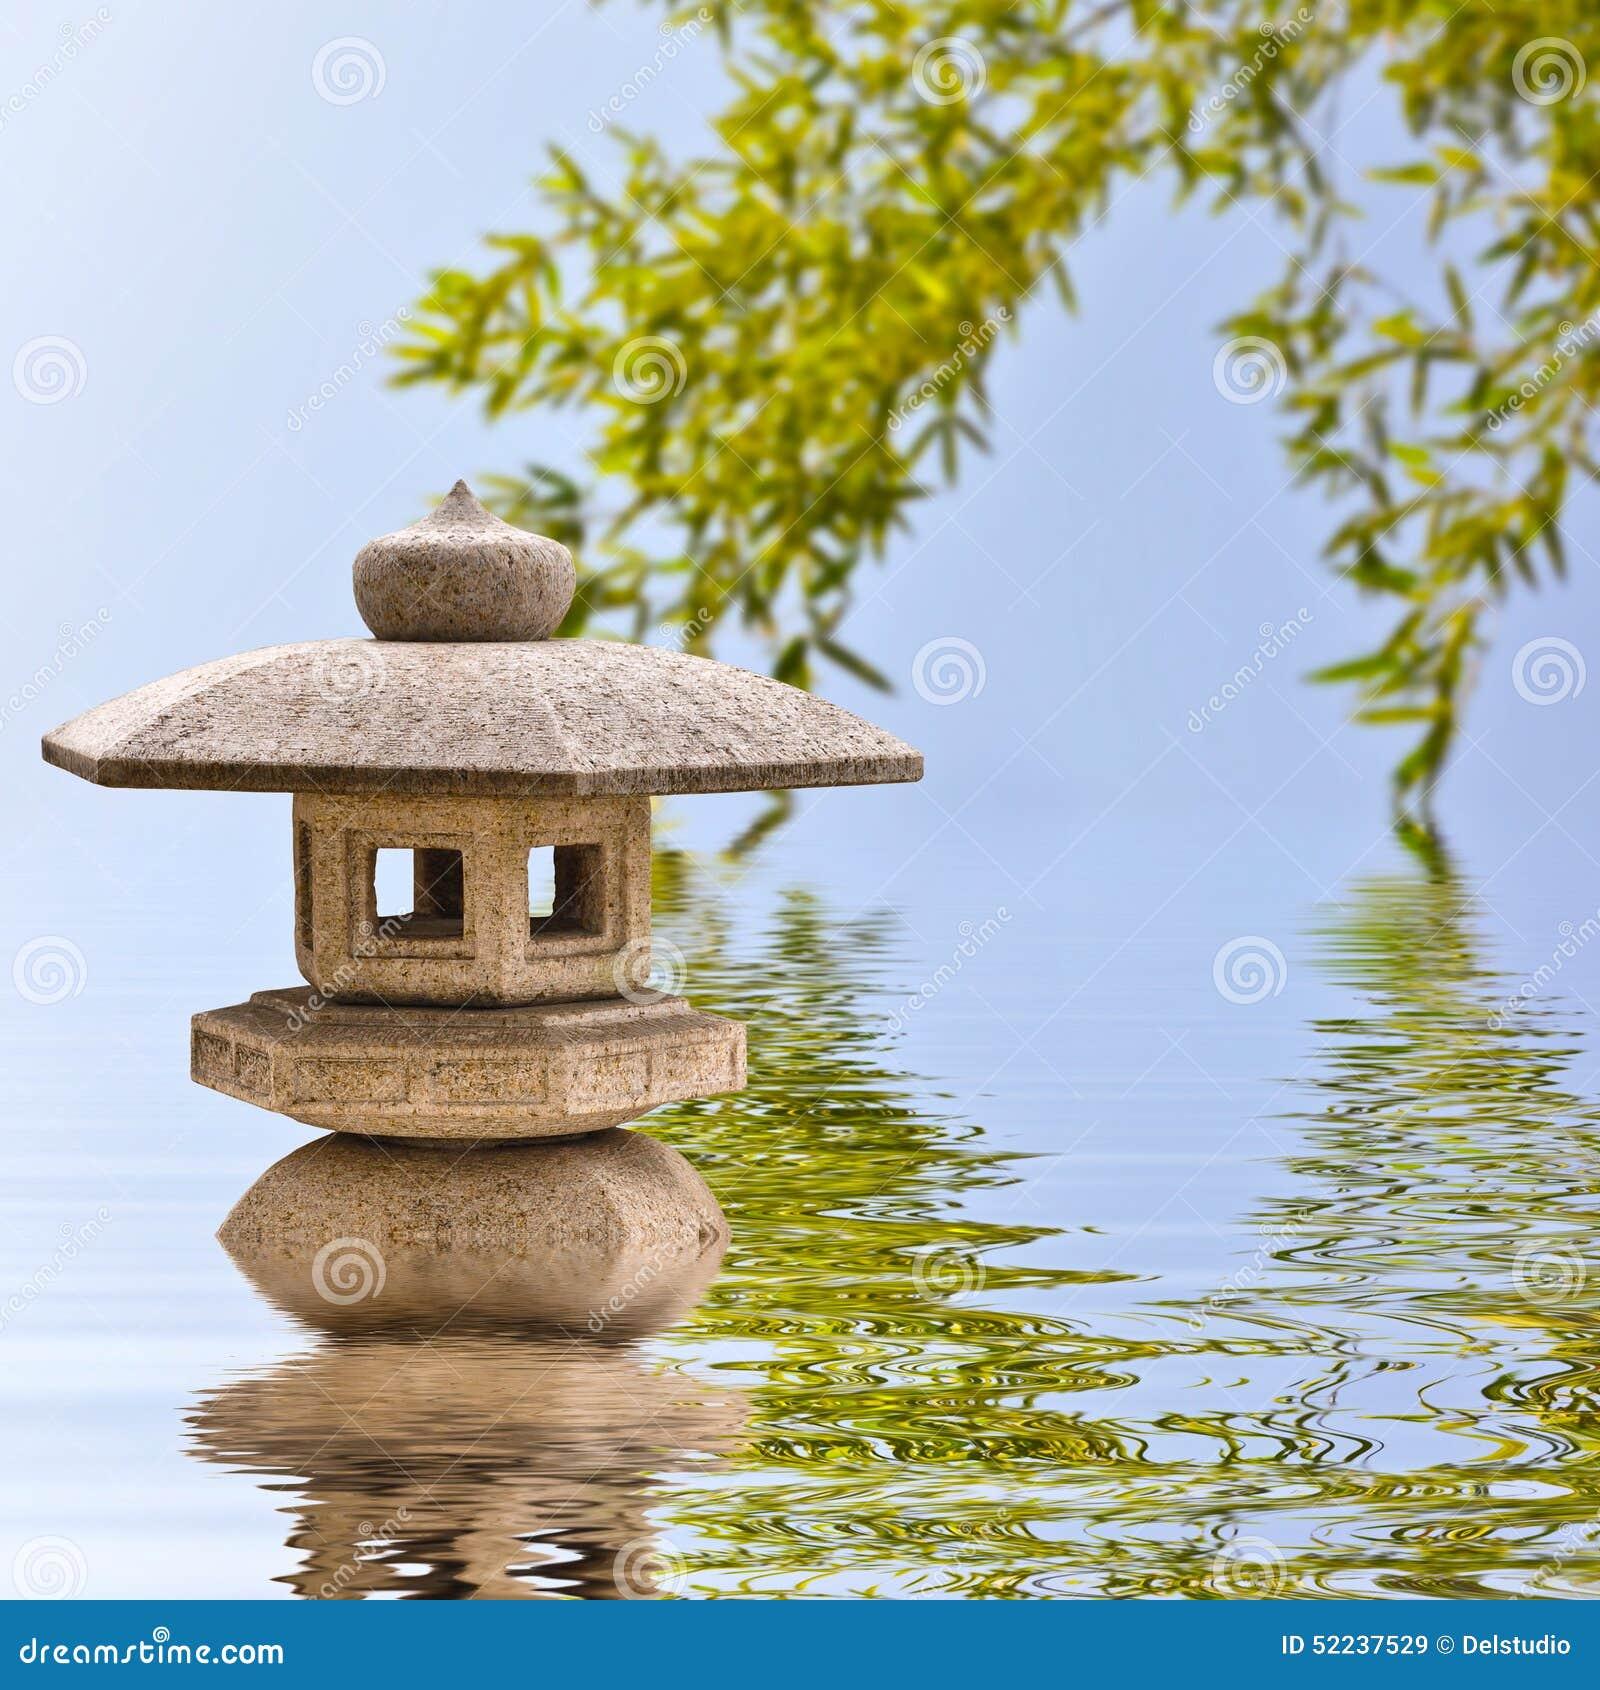 lanterne en pierre japonaise image stock image du esprit m ditation 52237529. Black Bedroom Furniture Sets. Home Design Ideas